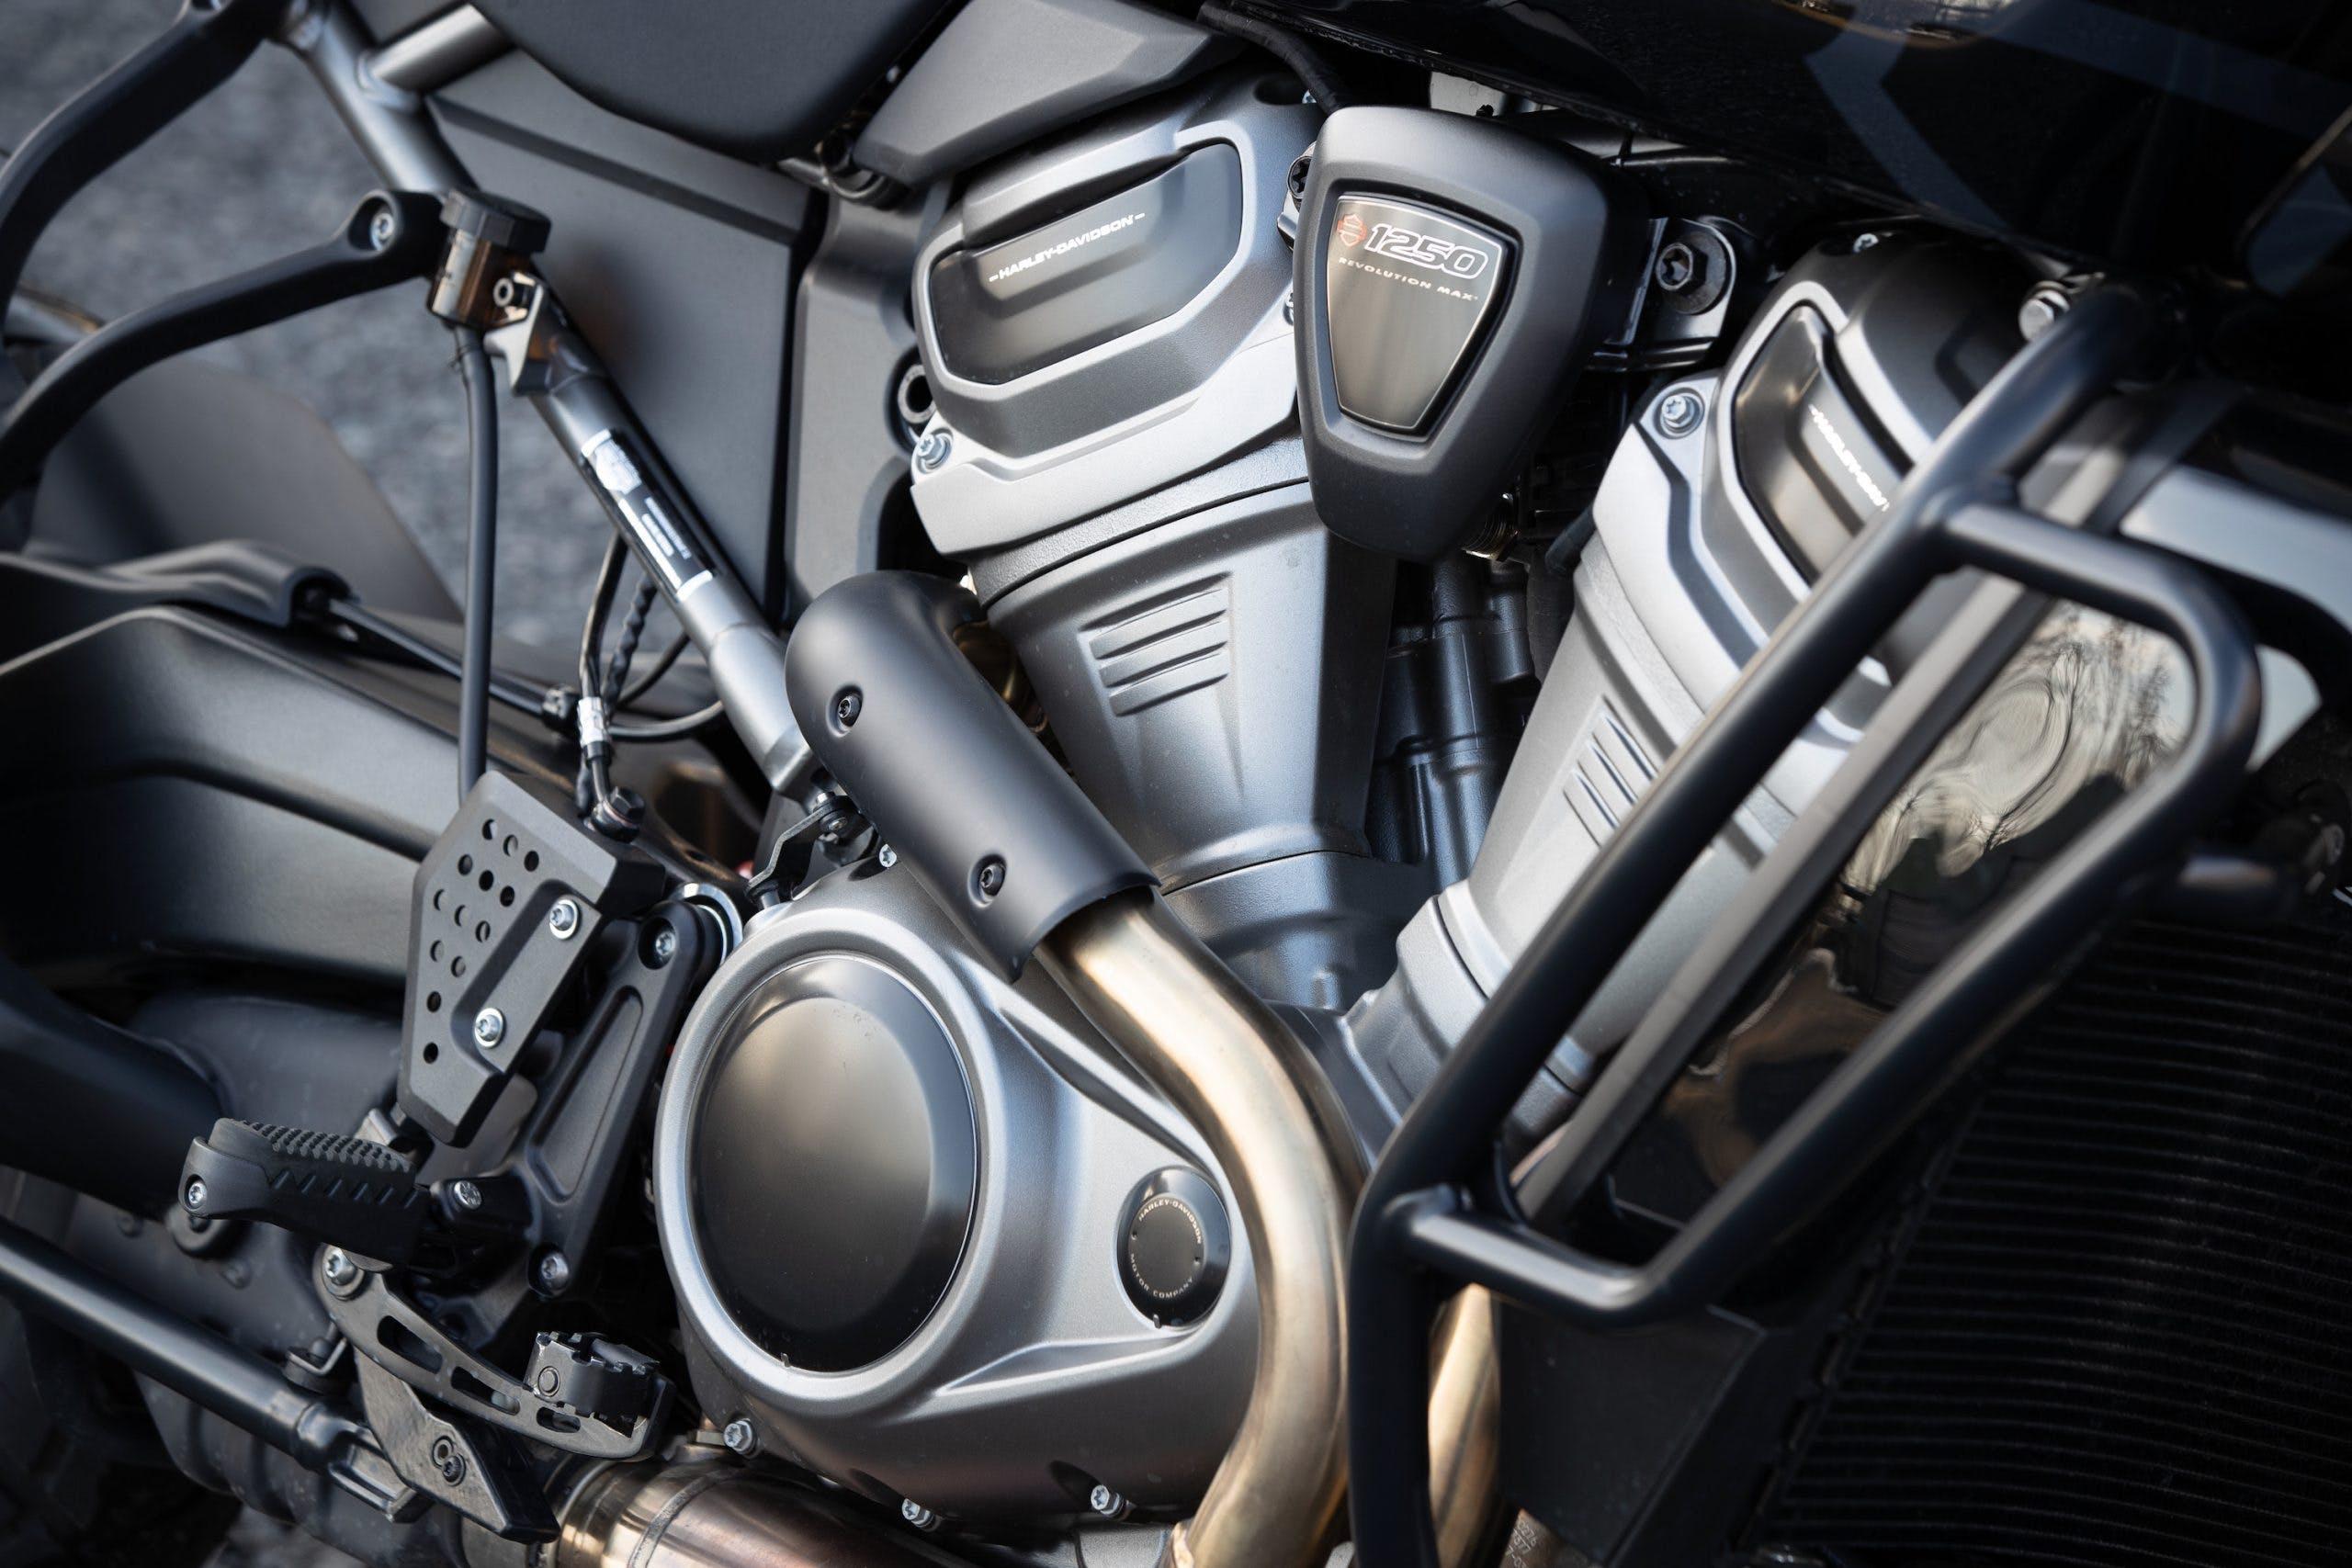 Harley Davidson Pan America motore revolution max